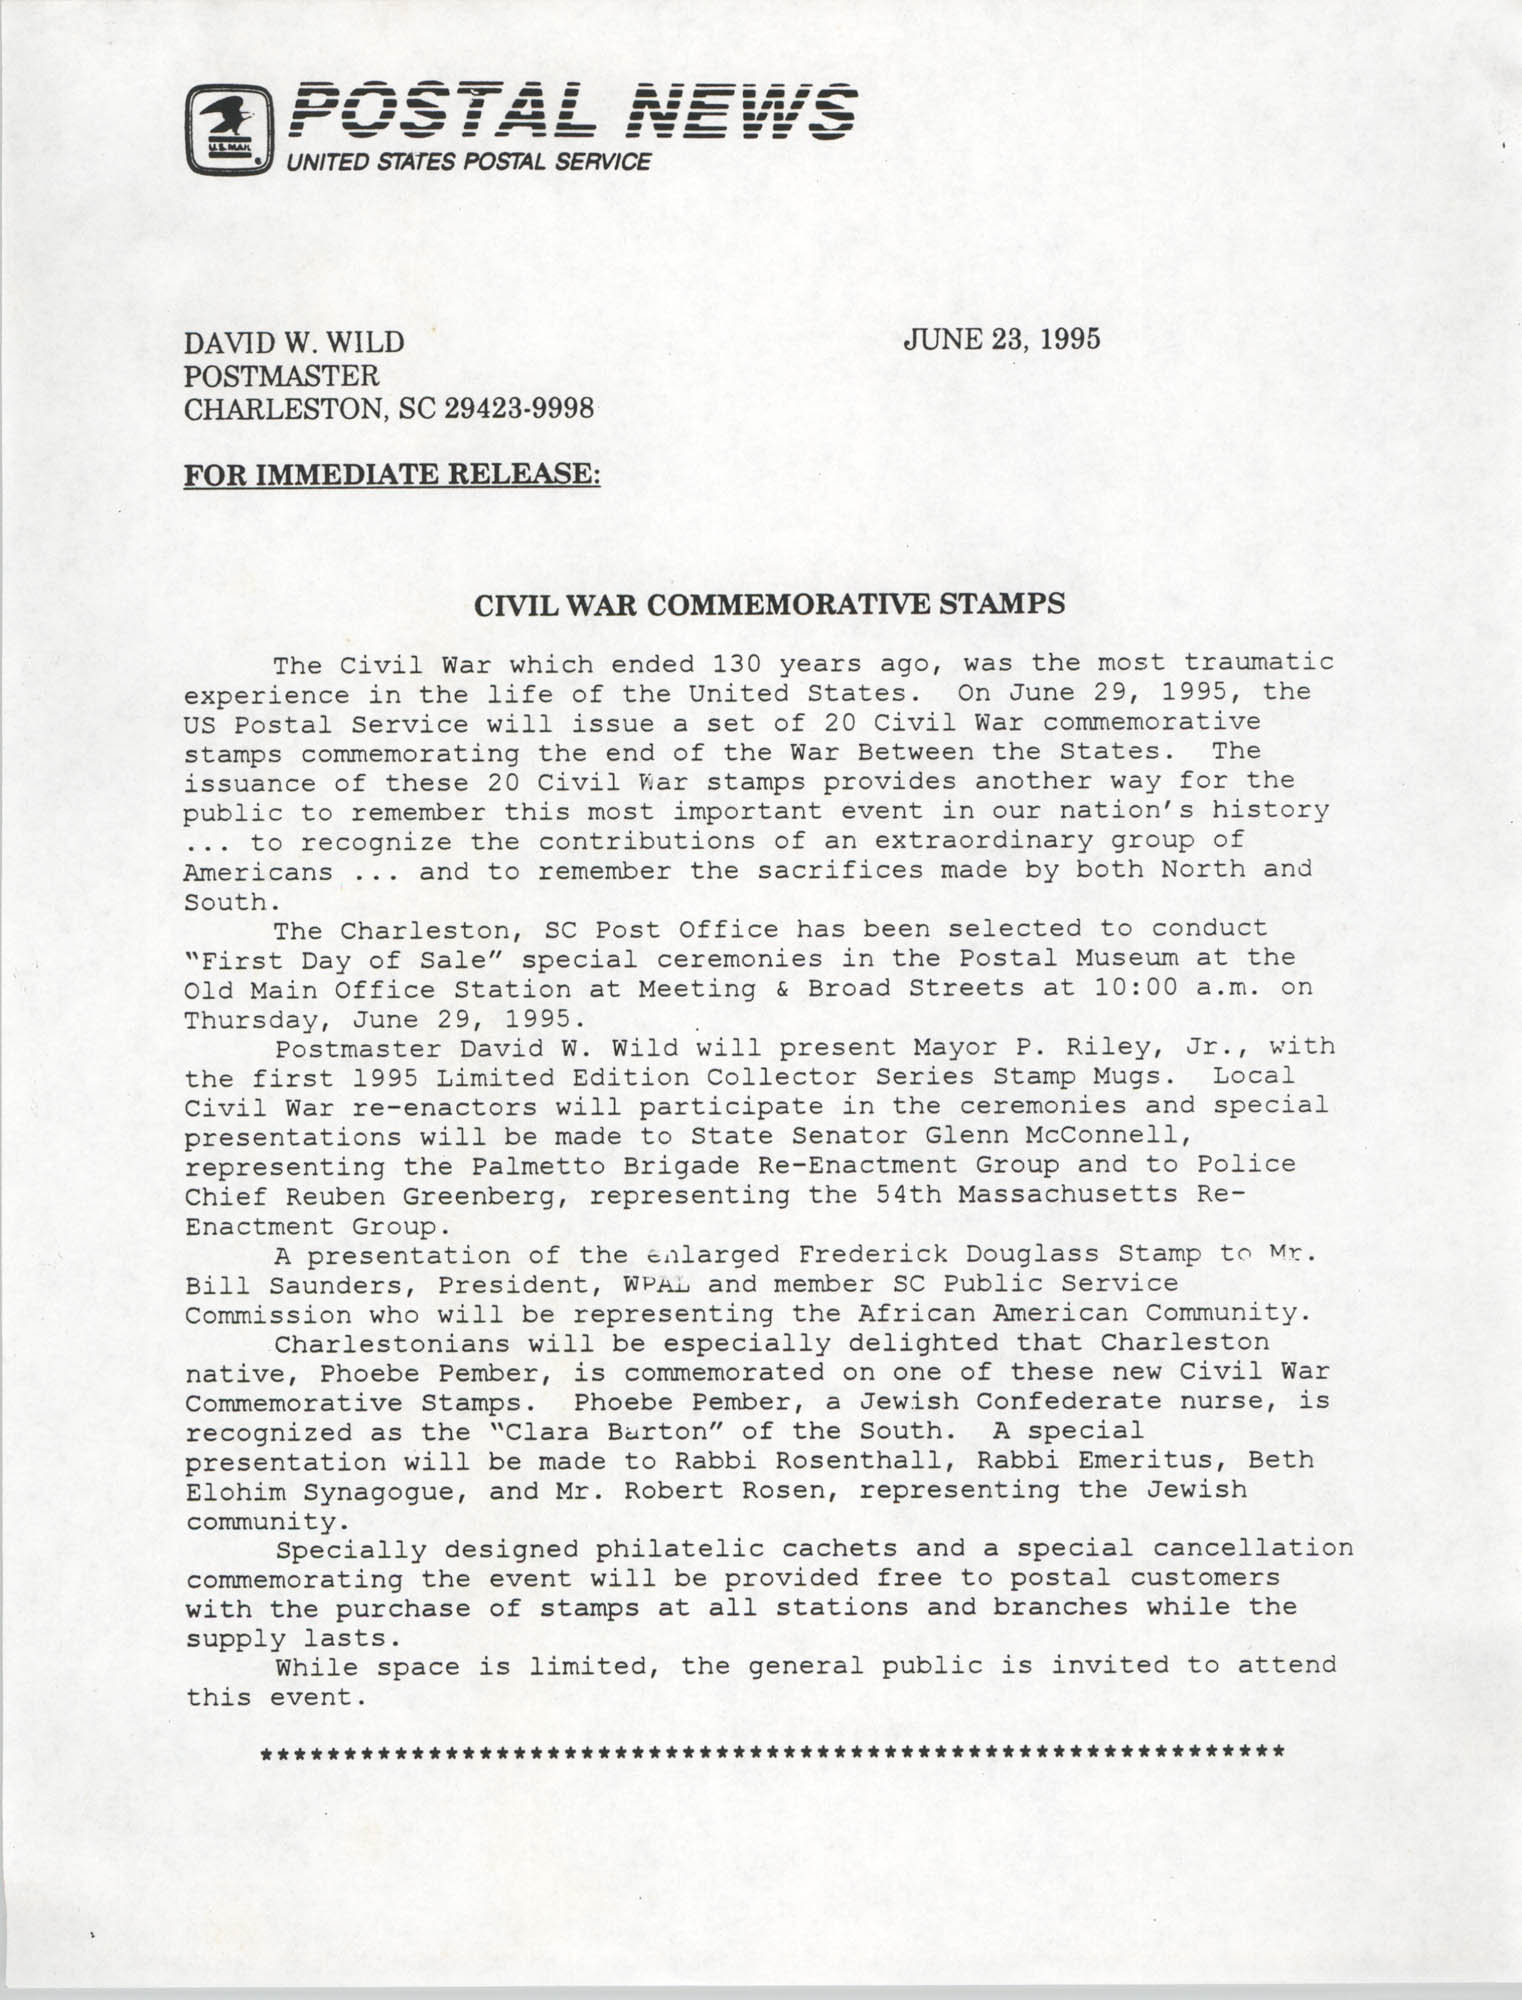 United States Postal Service, Postal News, Civil War Commemorative Stamps, June 23, 1995